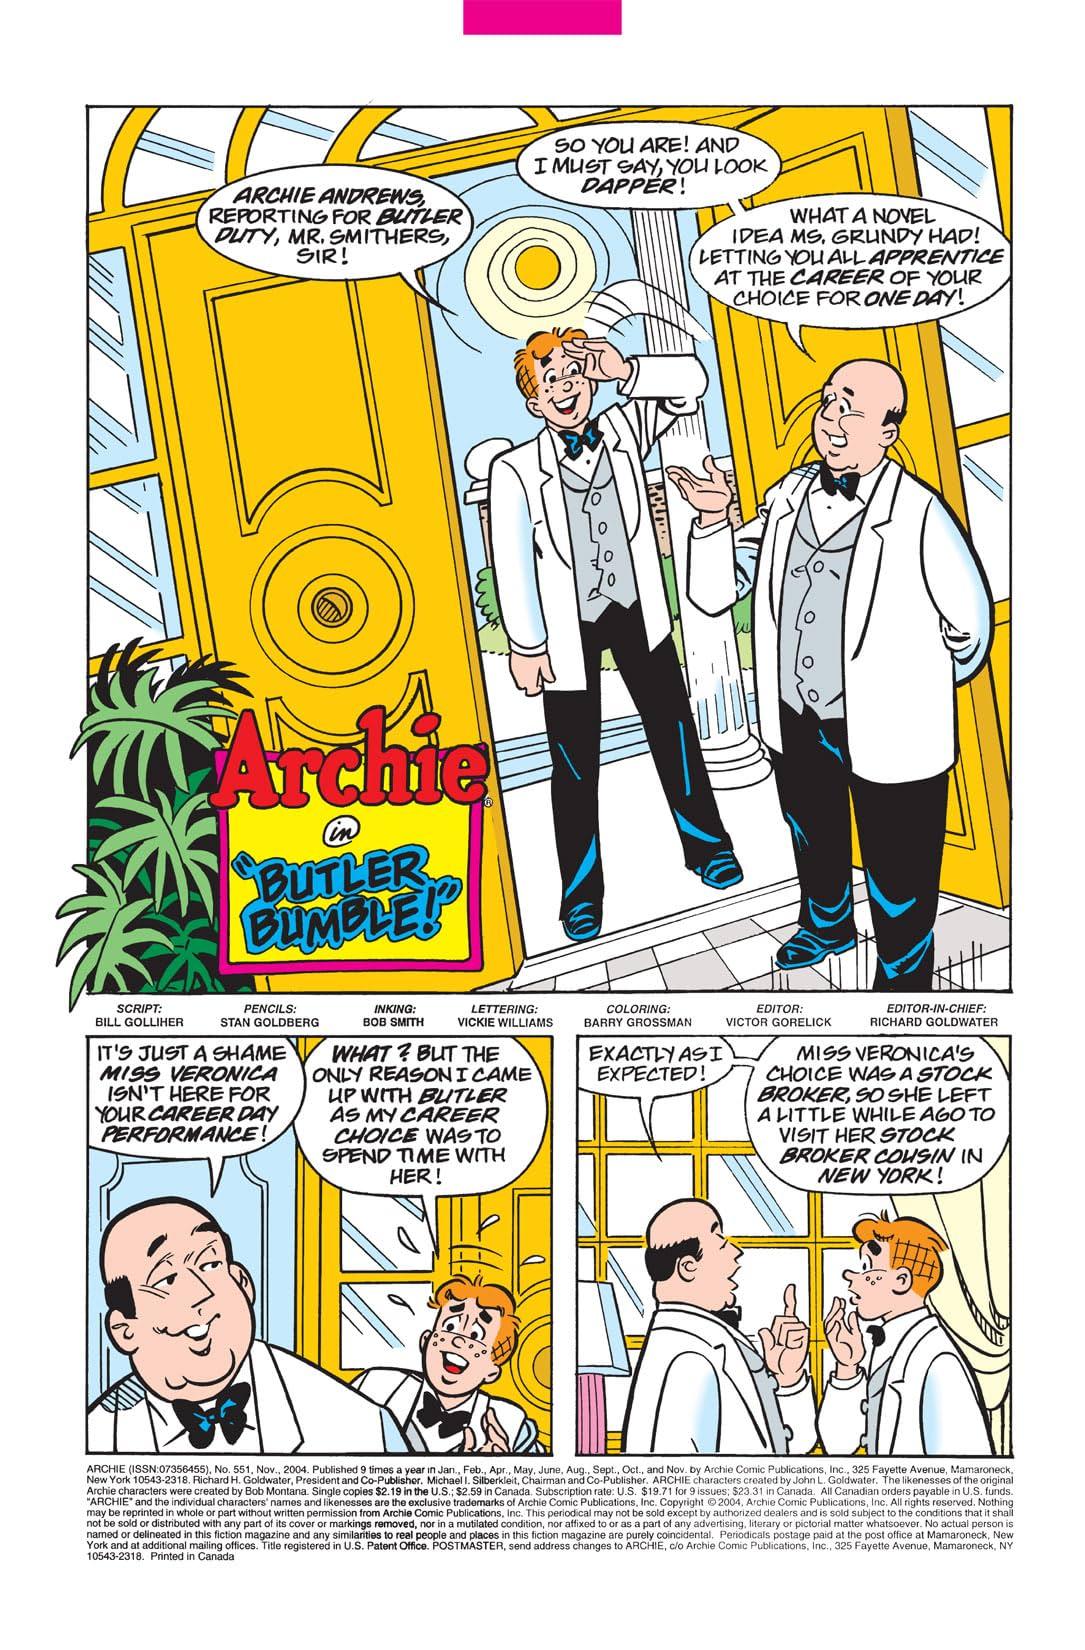 Archie #551